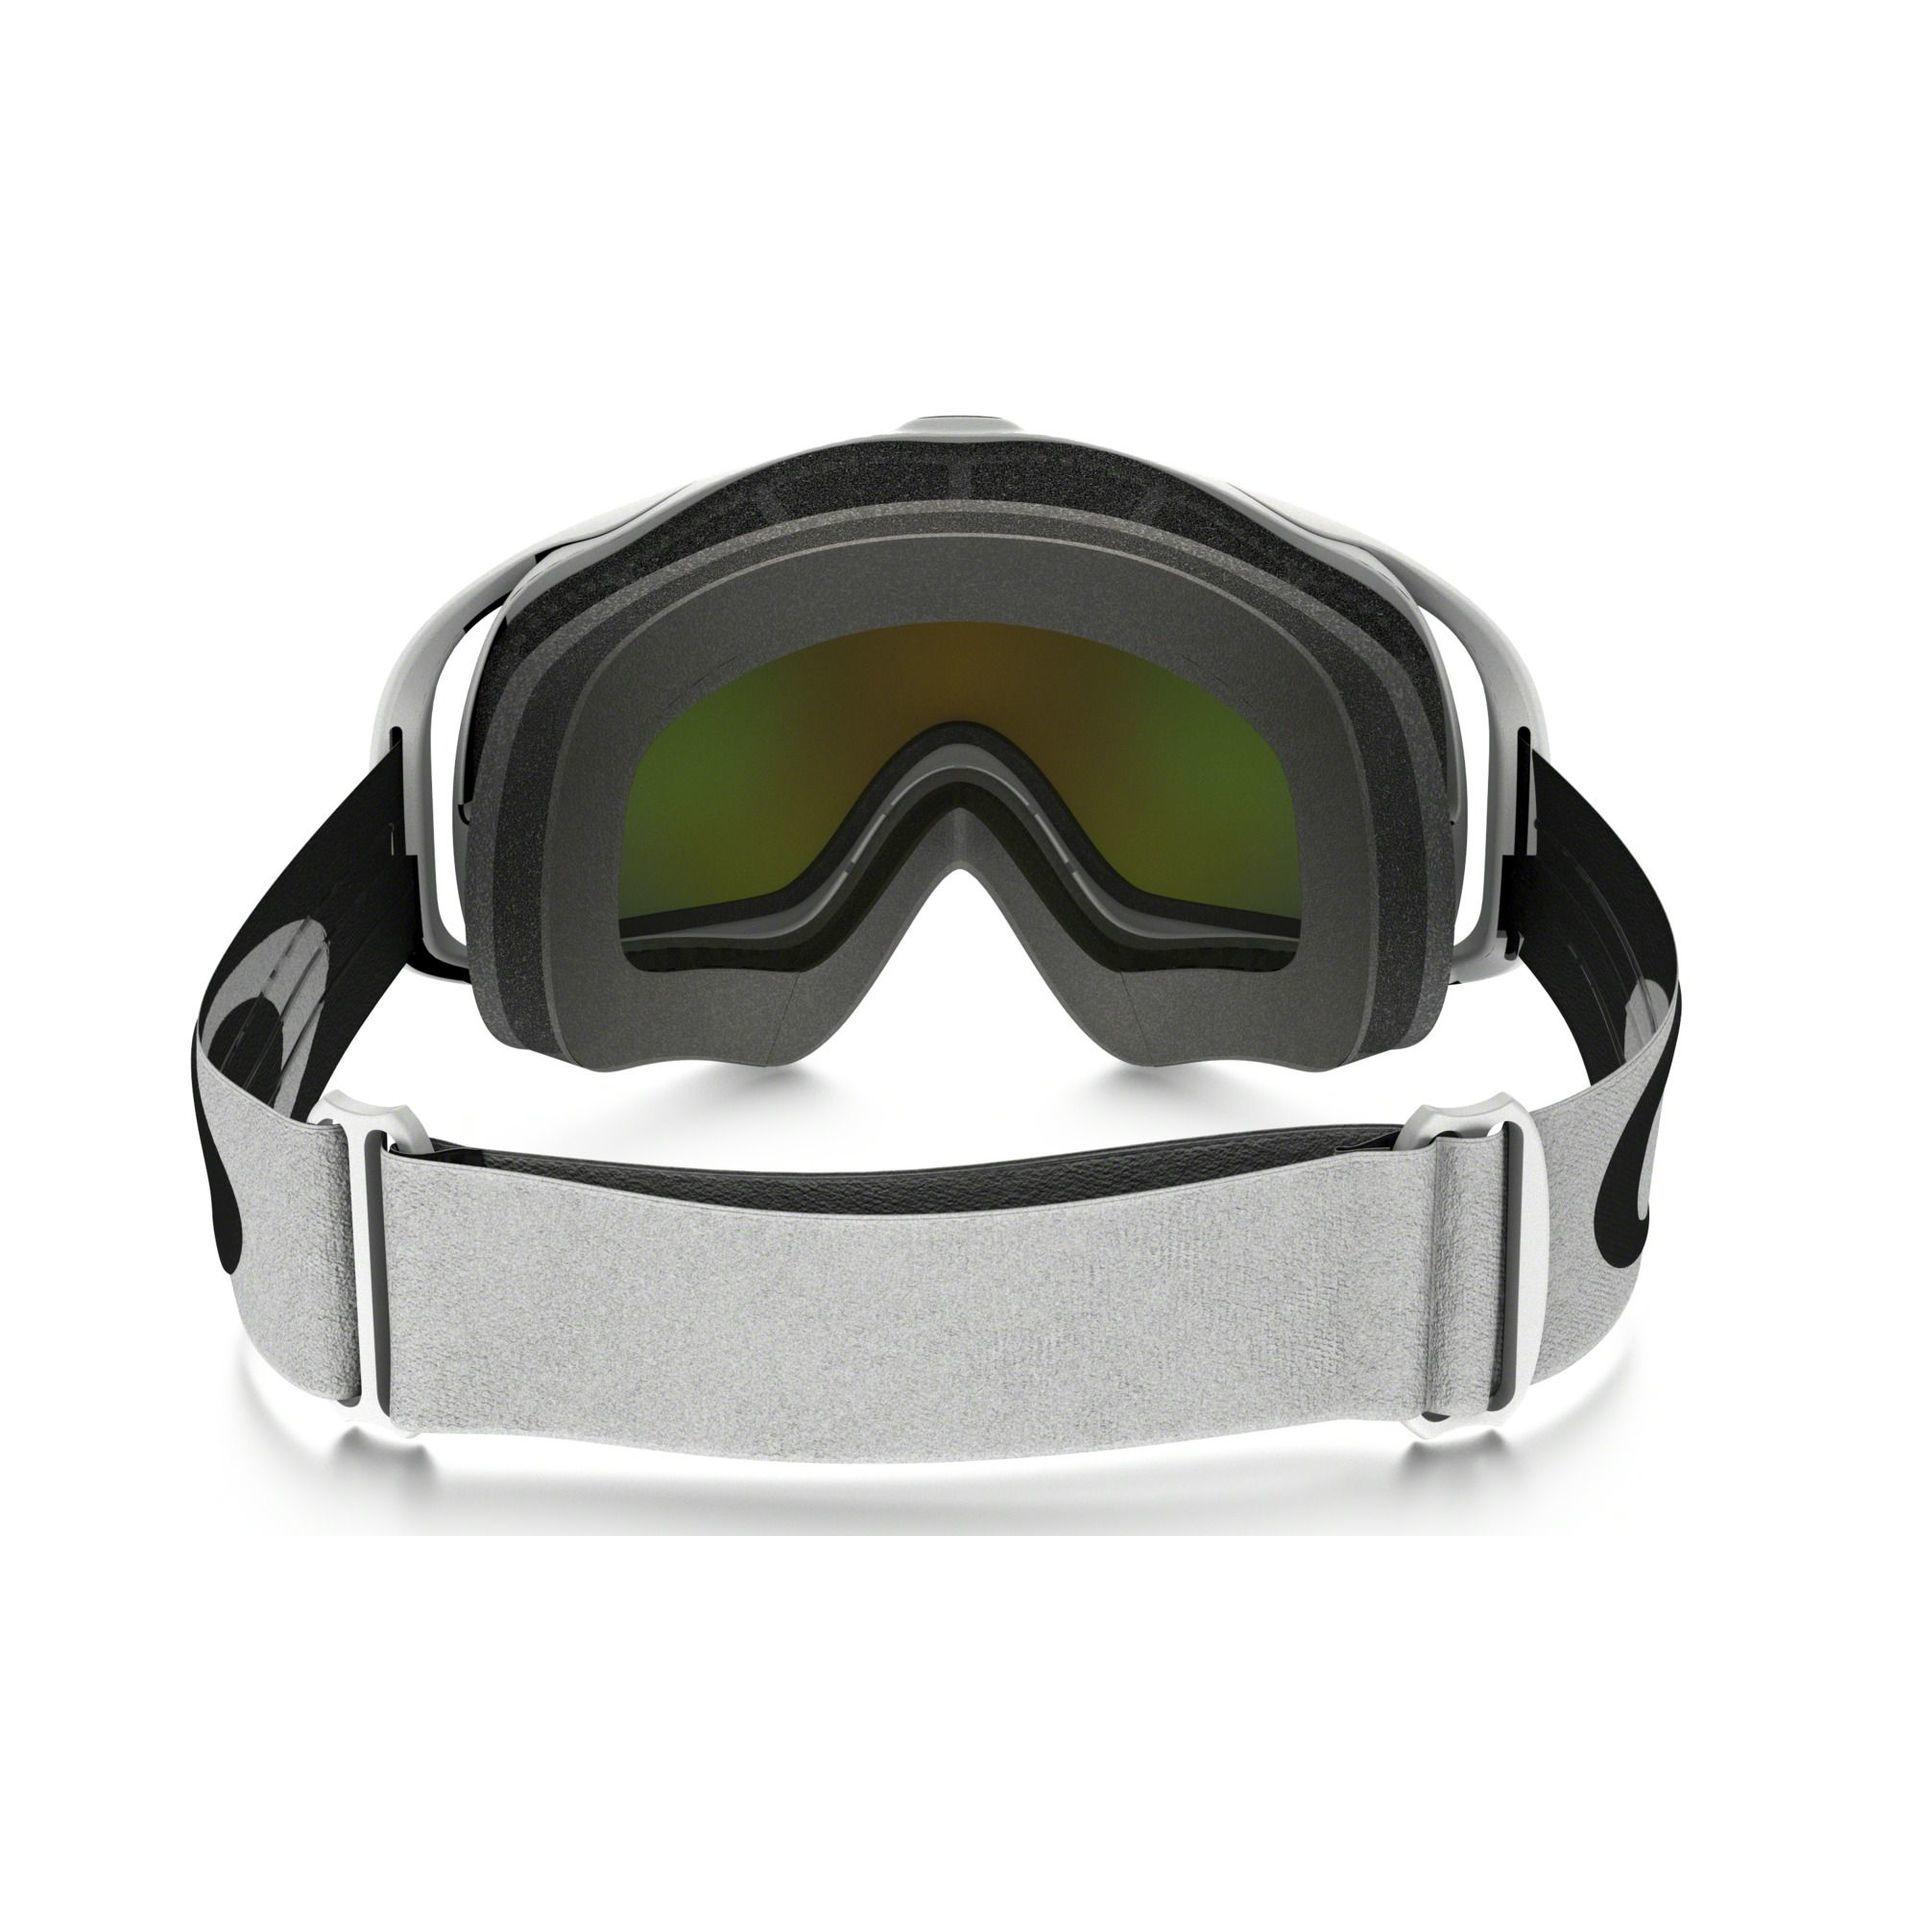 GOGLE SNOW OAKLEY CROWBAR MATTE WHITE|FIRE IRIDIUM 2